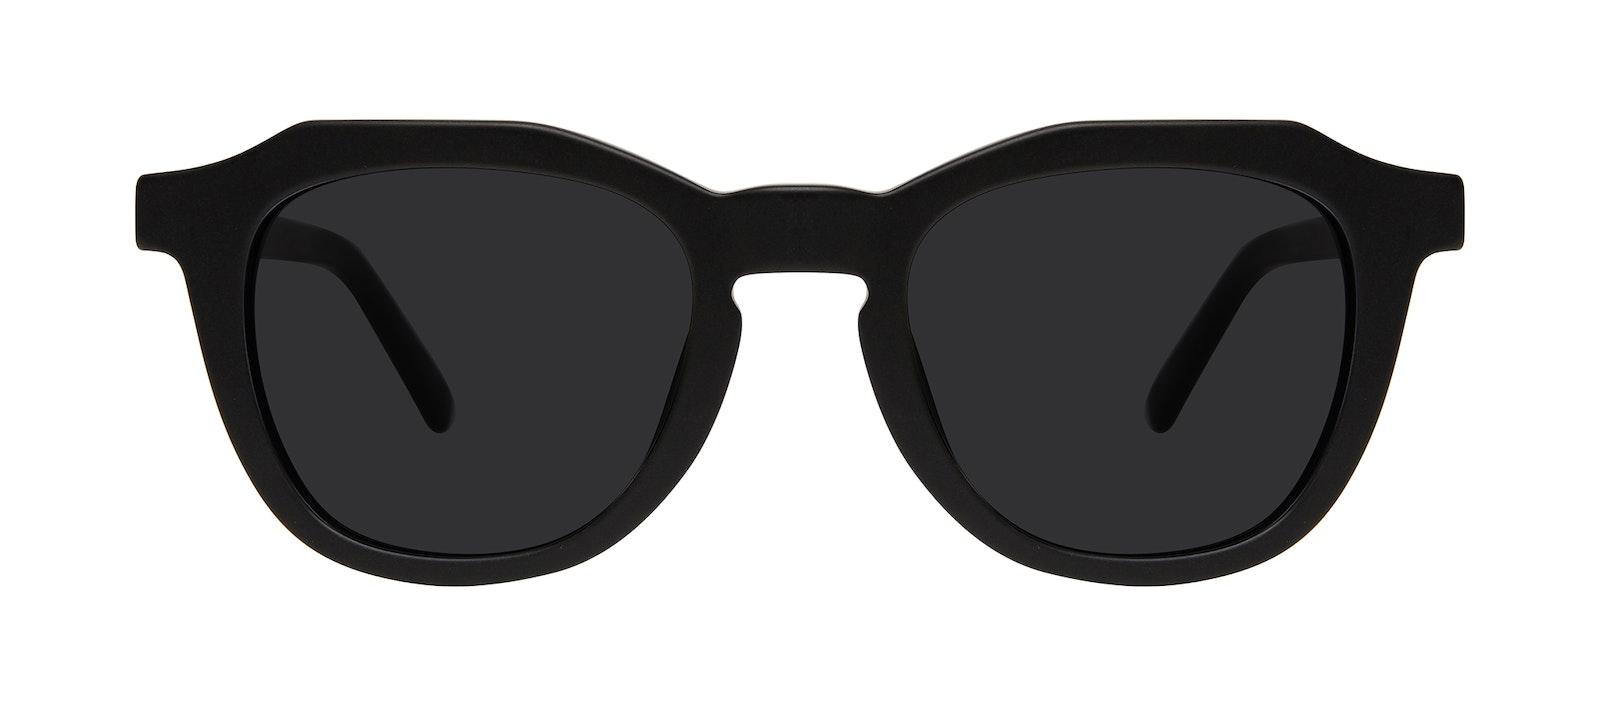 Affordable Fashion Glasses Square Sunglasses Men Action Matte Black Front